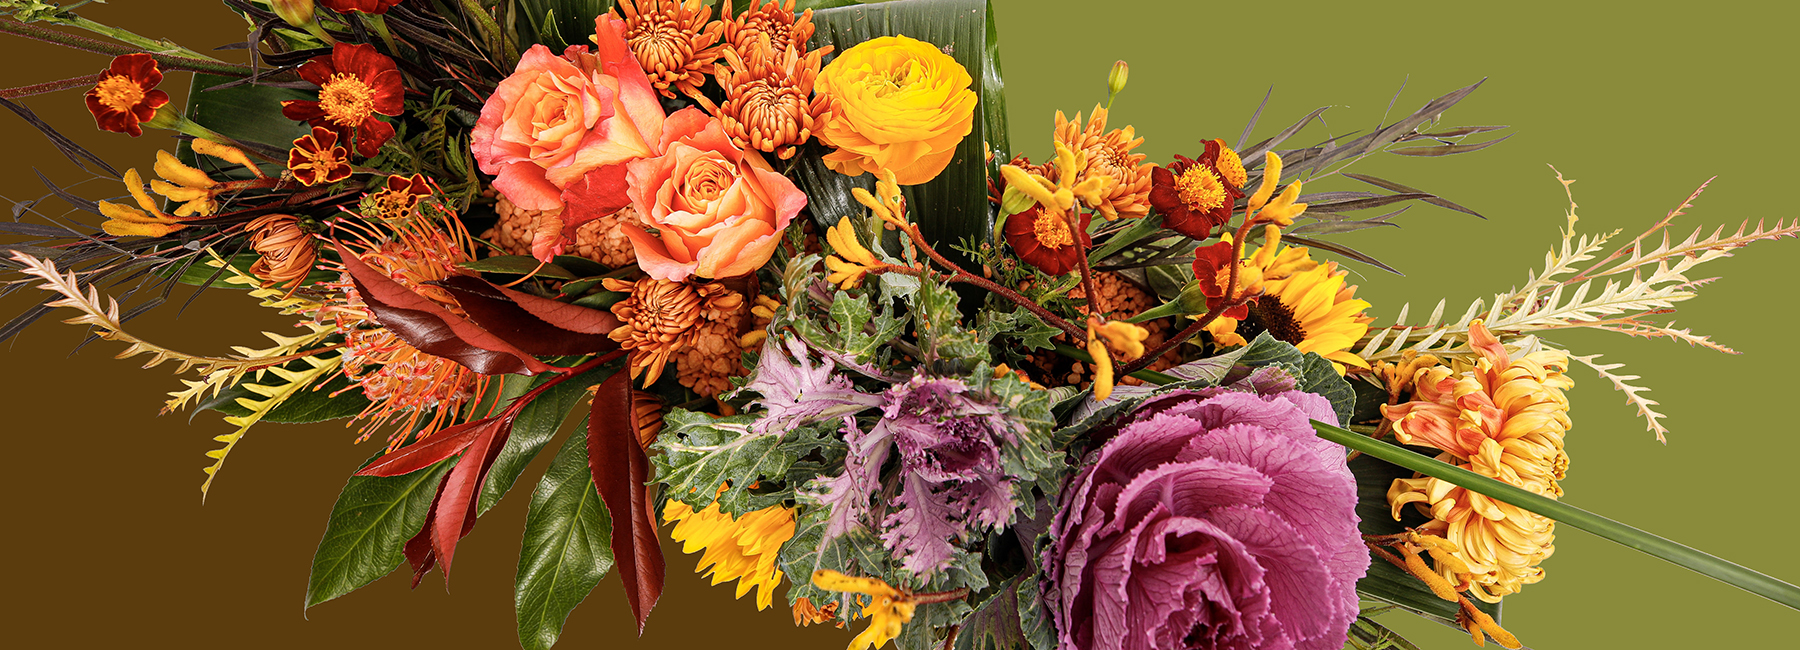 Beards Floral Design Wichita Florist